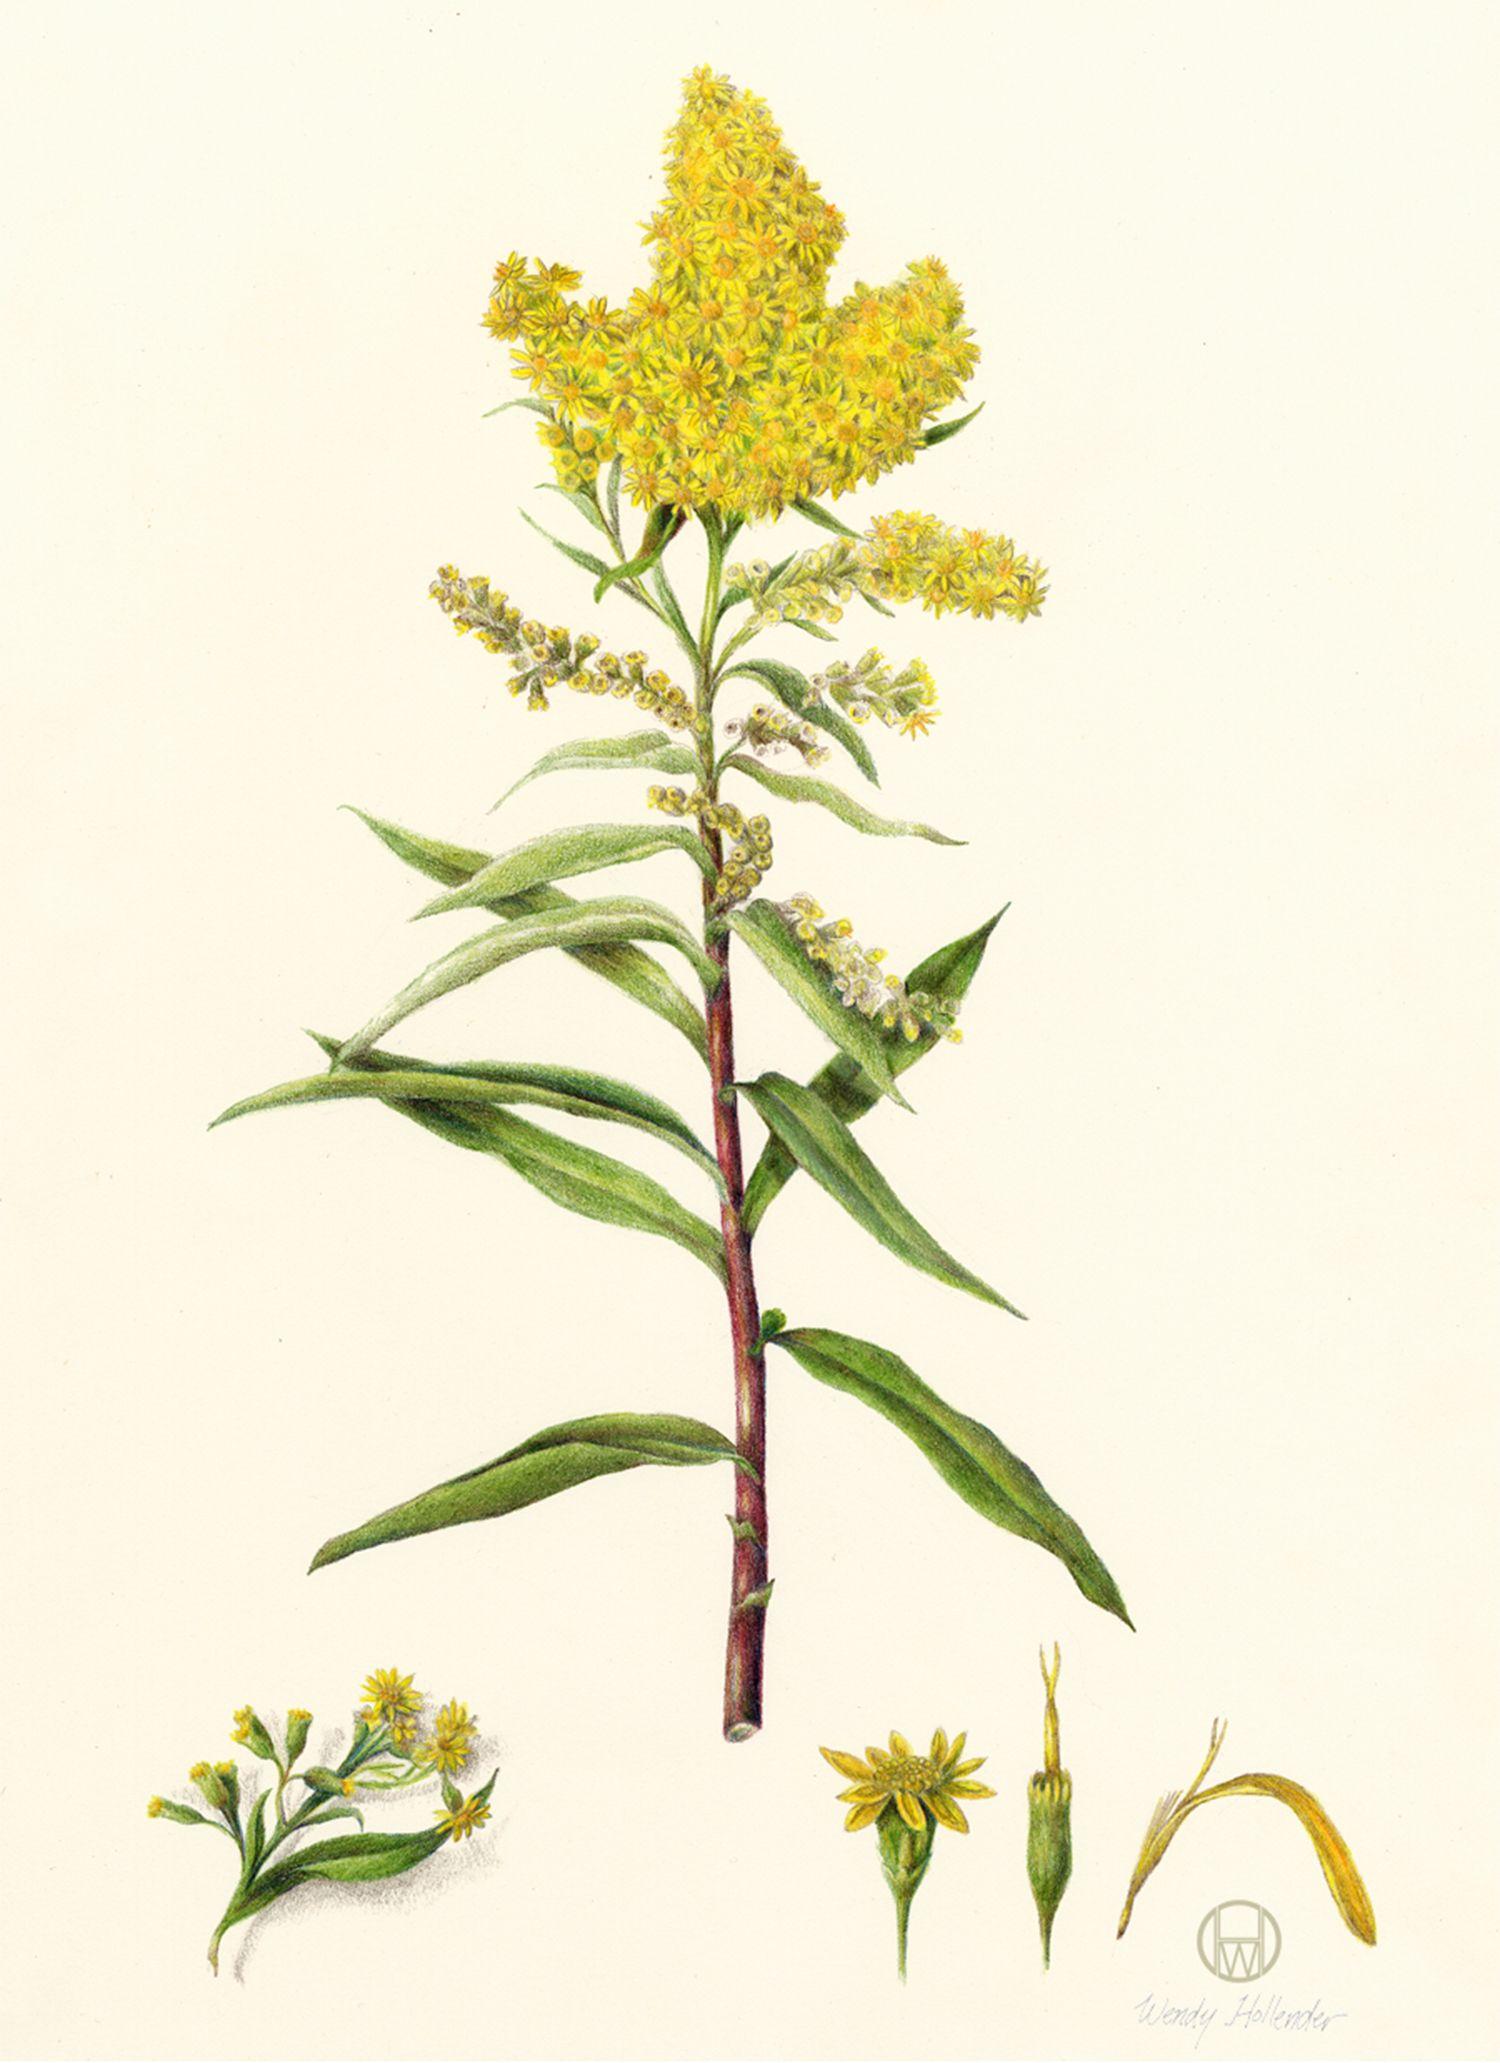 Seaside Goldenrod Solidago Sempervirens Goldenrod Flower Botanical Illustration Goldenrod